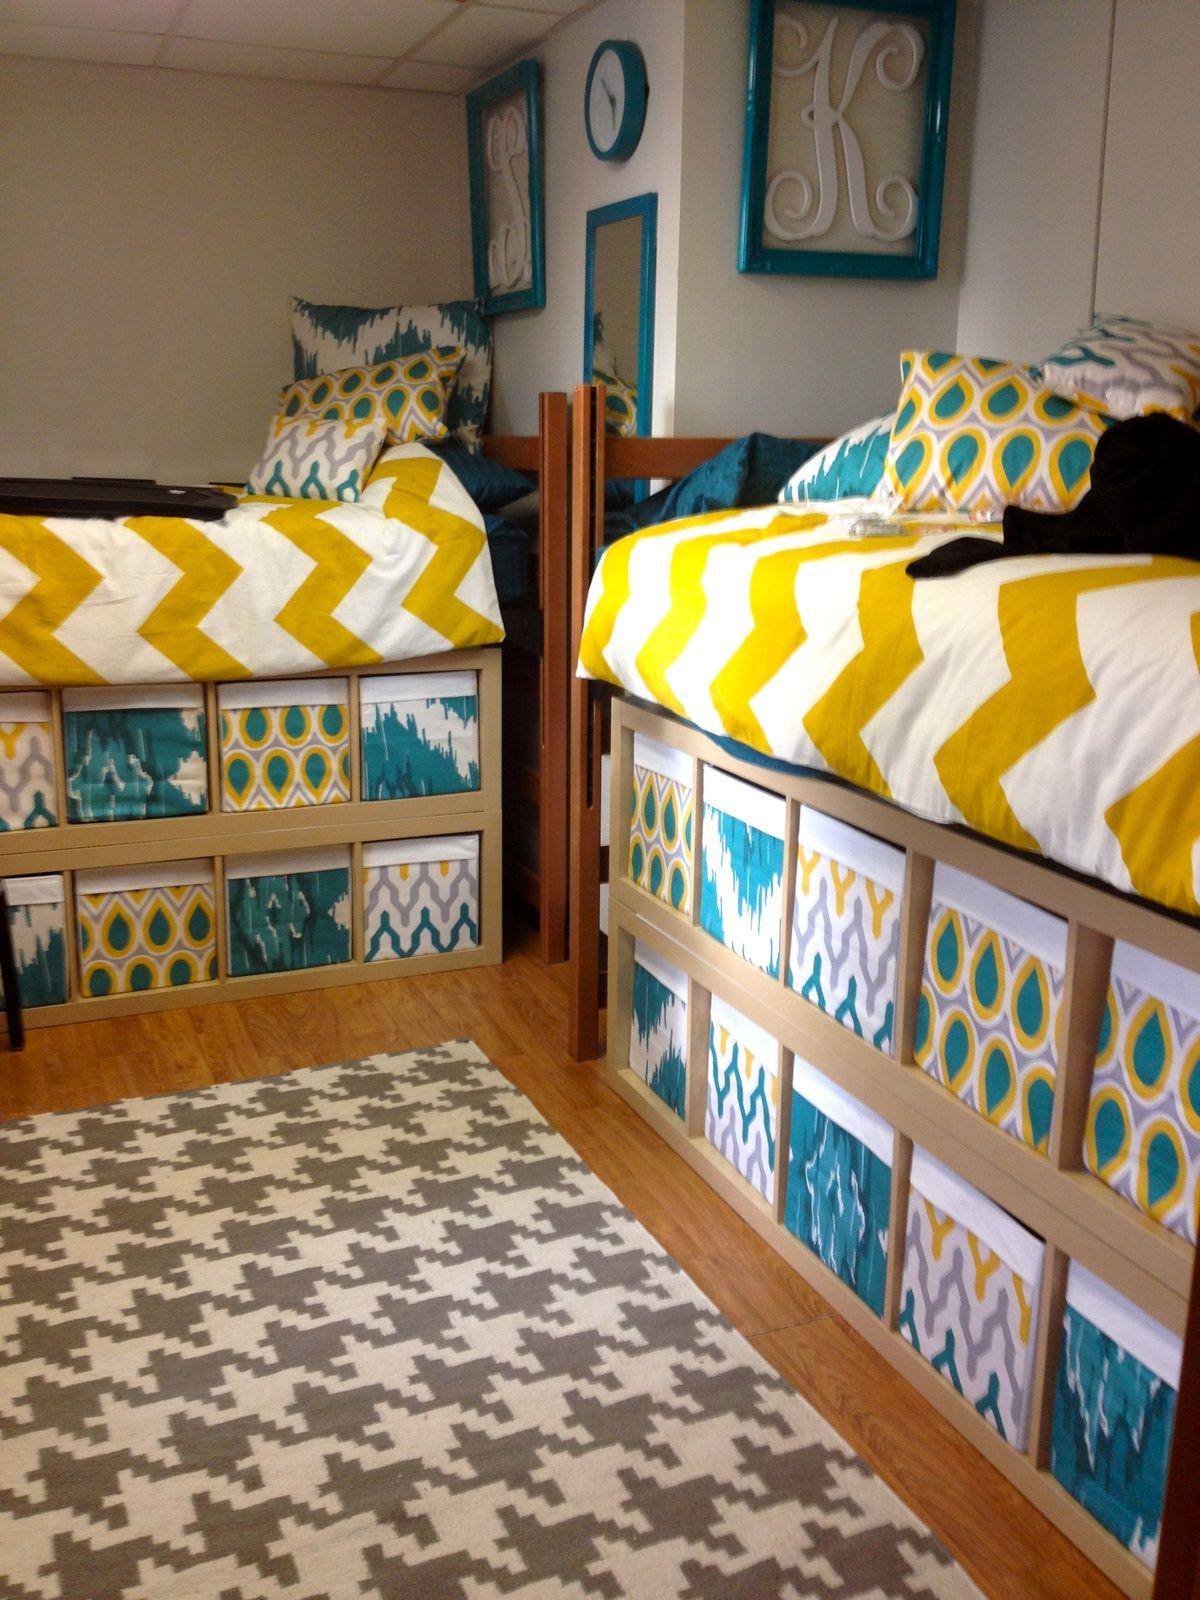 Dc7df1d4a462fe814520c406e775bb9d Jpg 1 200 1 600 Pixels Cute Dorm Rooms Dorm Room Bedding Dorm Room Storage